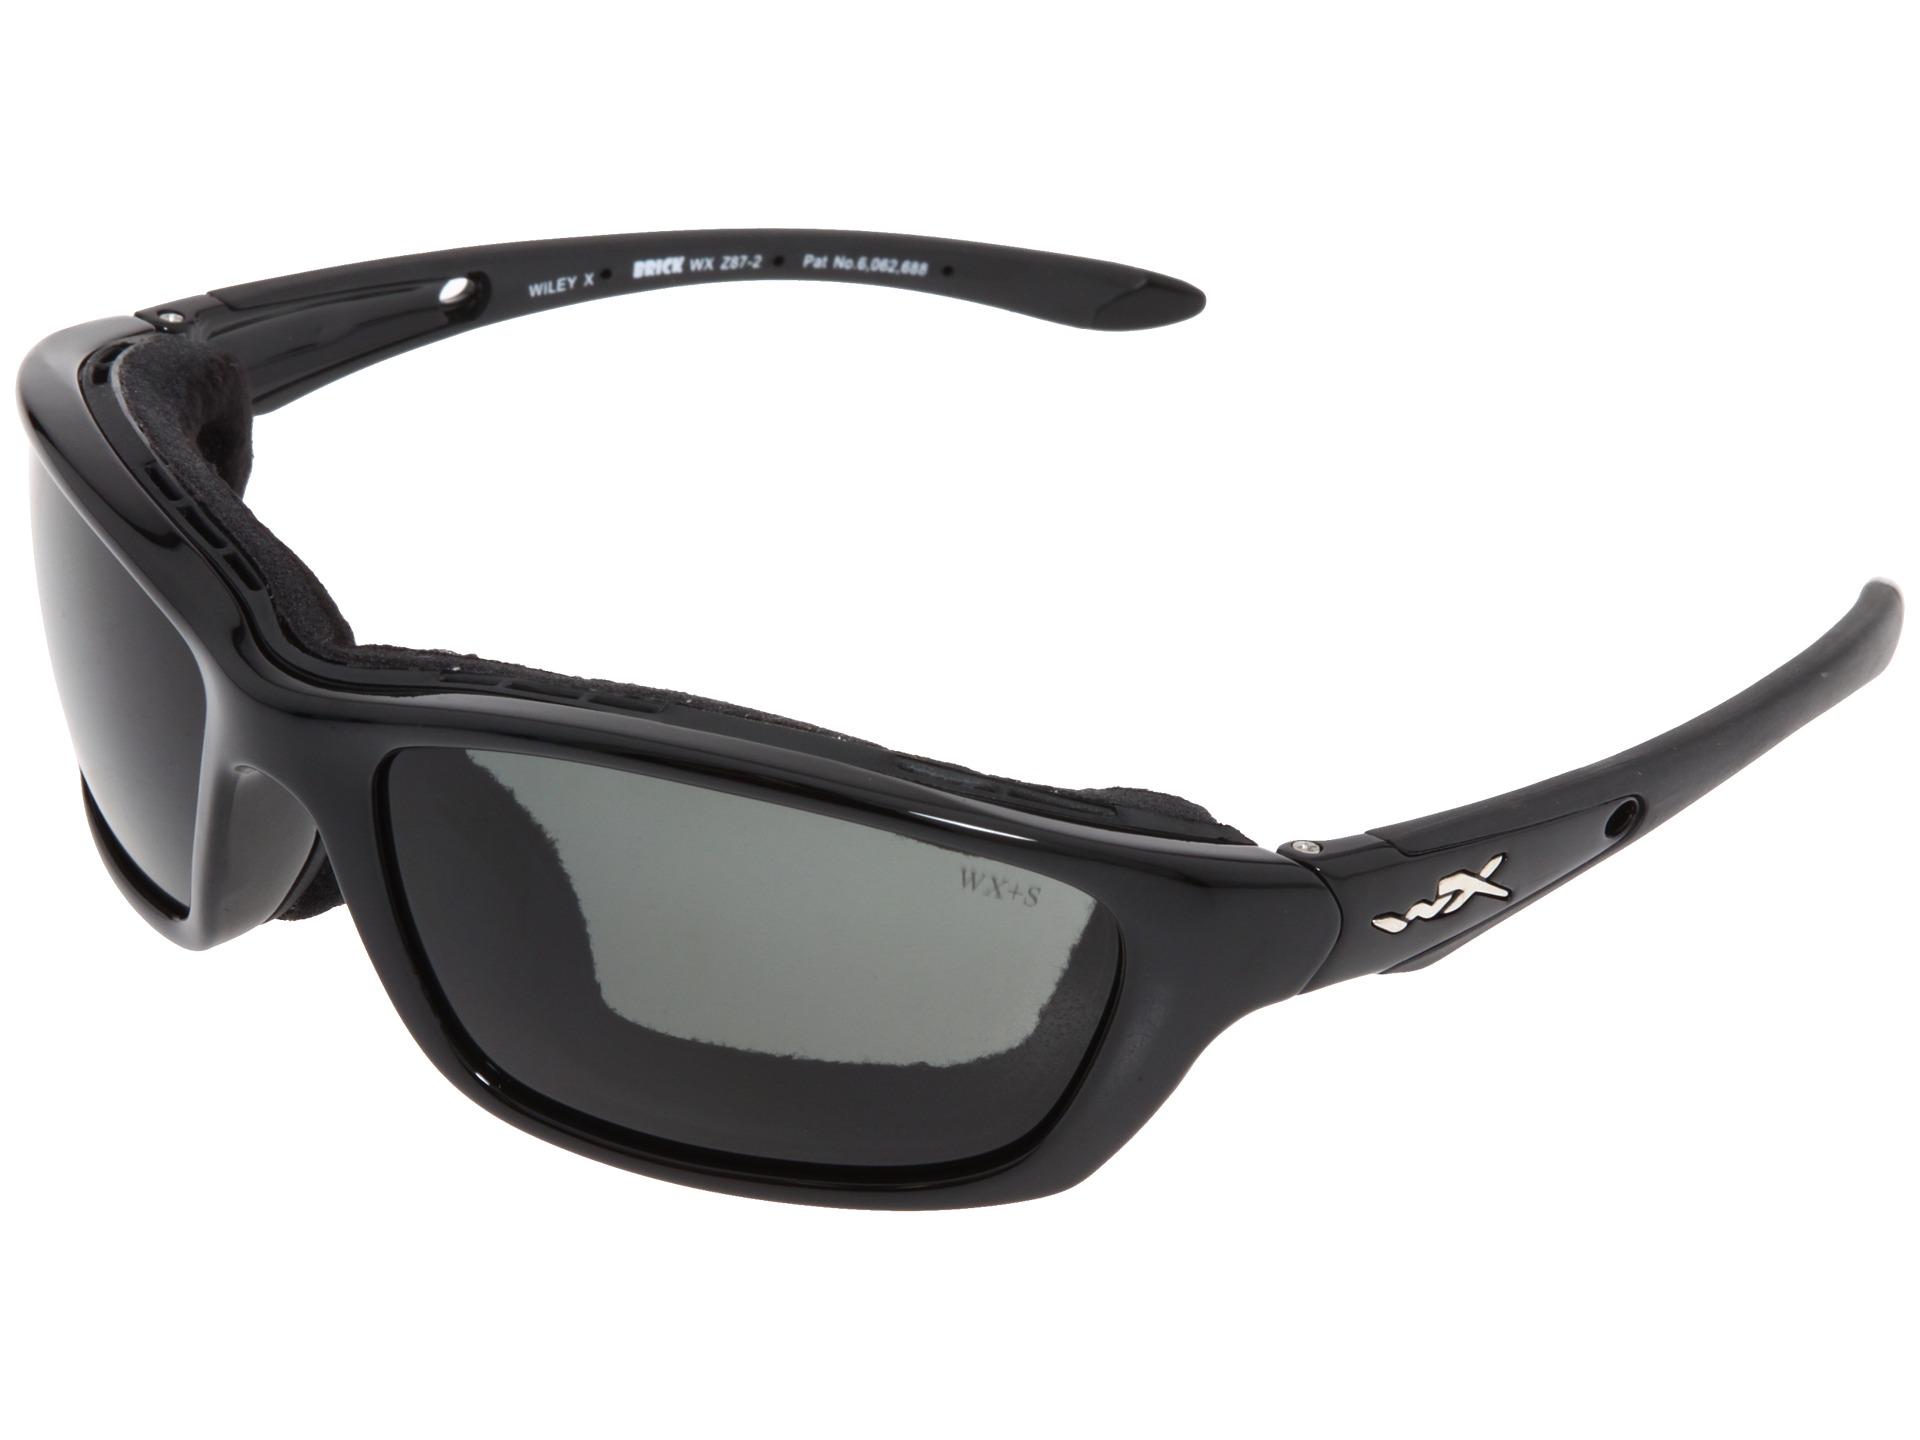 c502eb732ca Wiley X Eyewear Brick Polarized BOTH Ways on PopScreen